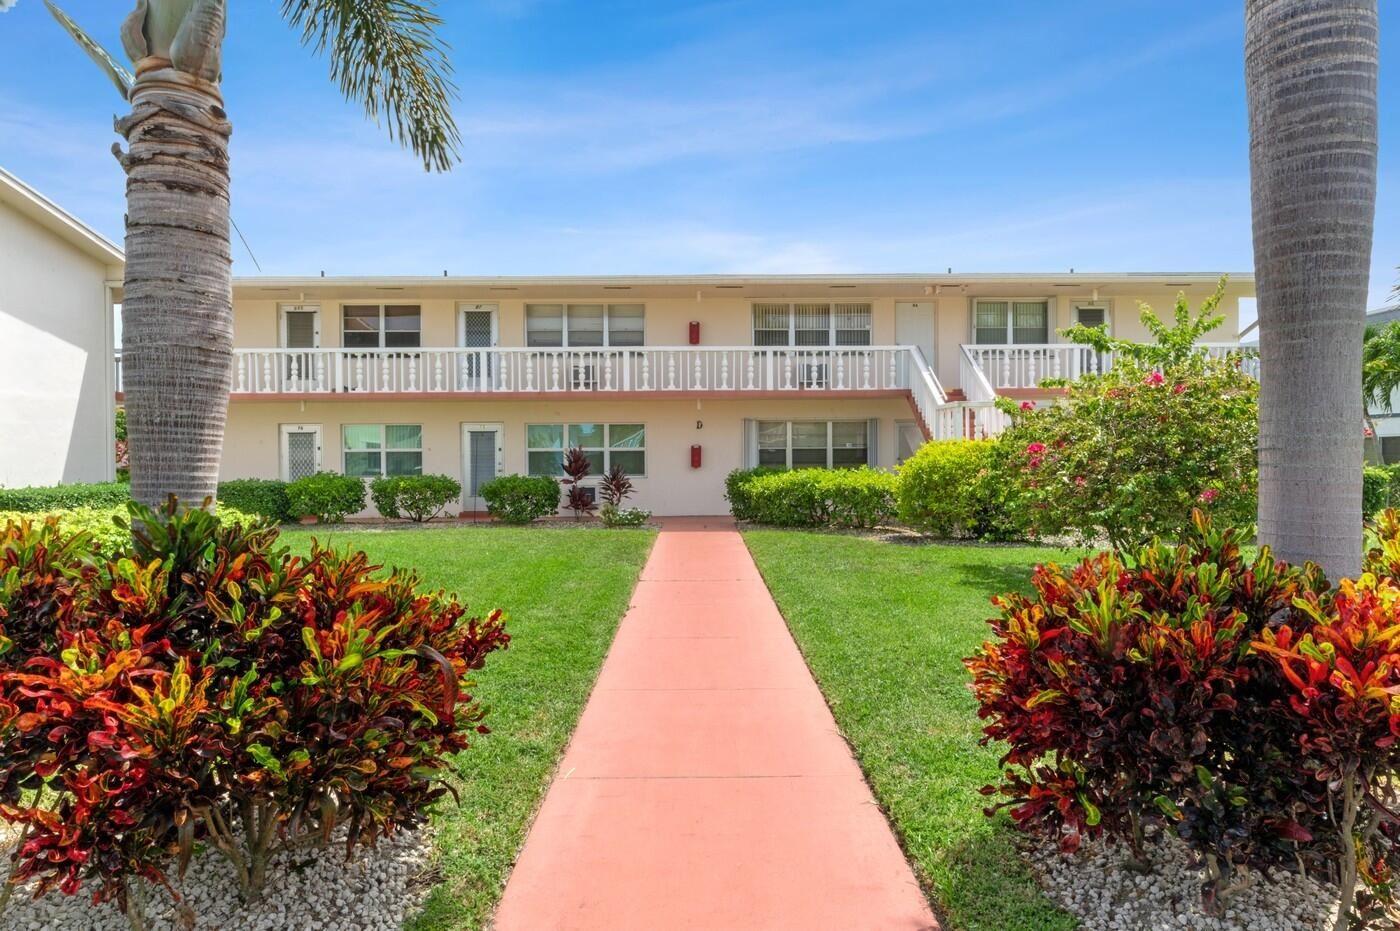 87 Coventry D, West Palm Beach, FL 33417 - MLS#: RX-10741162